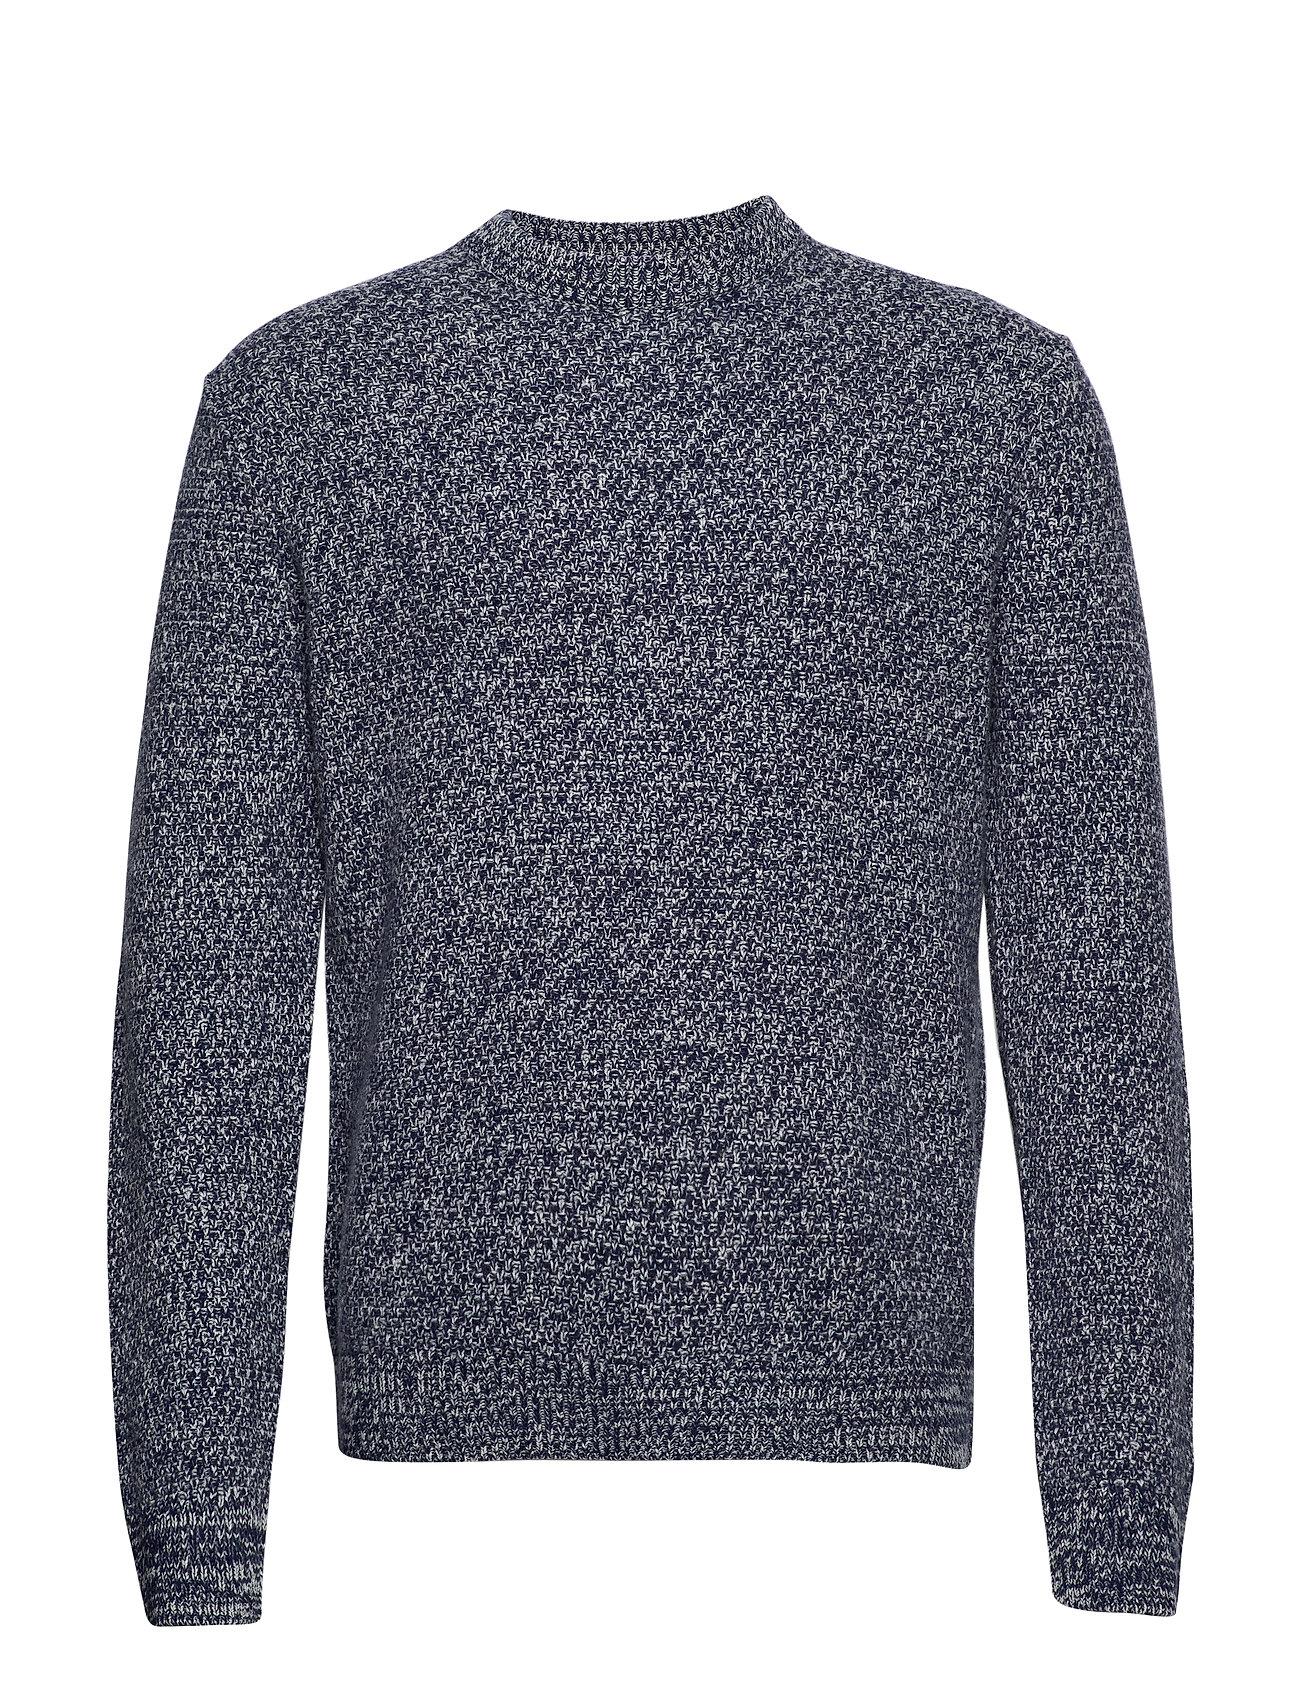 Filippa K M. Tobias Sweater - NAVY